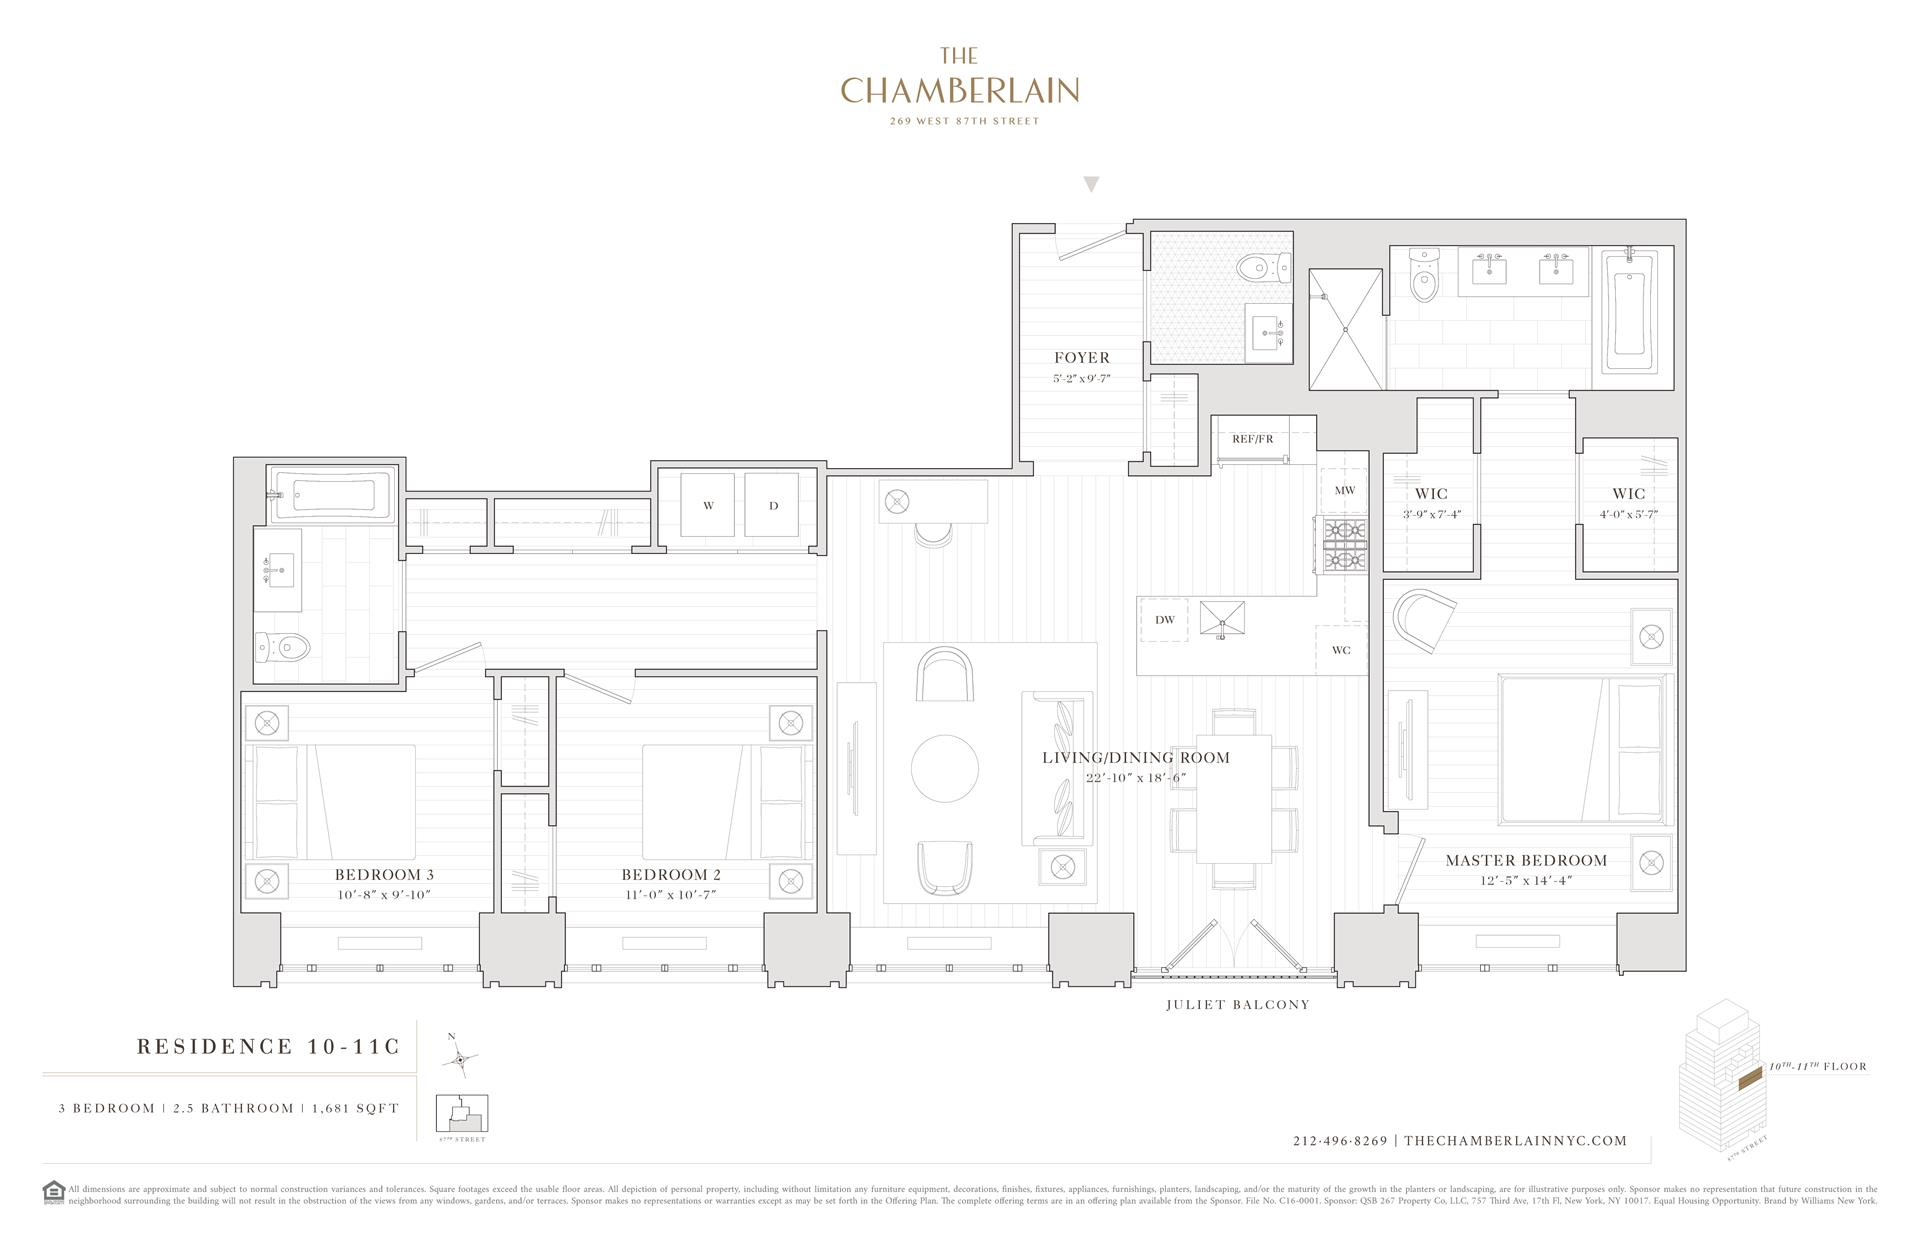 Floor plan of 269 West 87th St, 11C - Upper West Side, New York